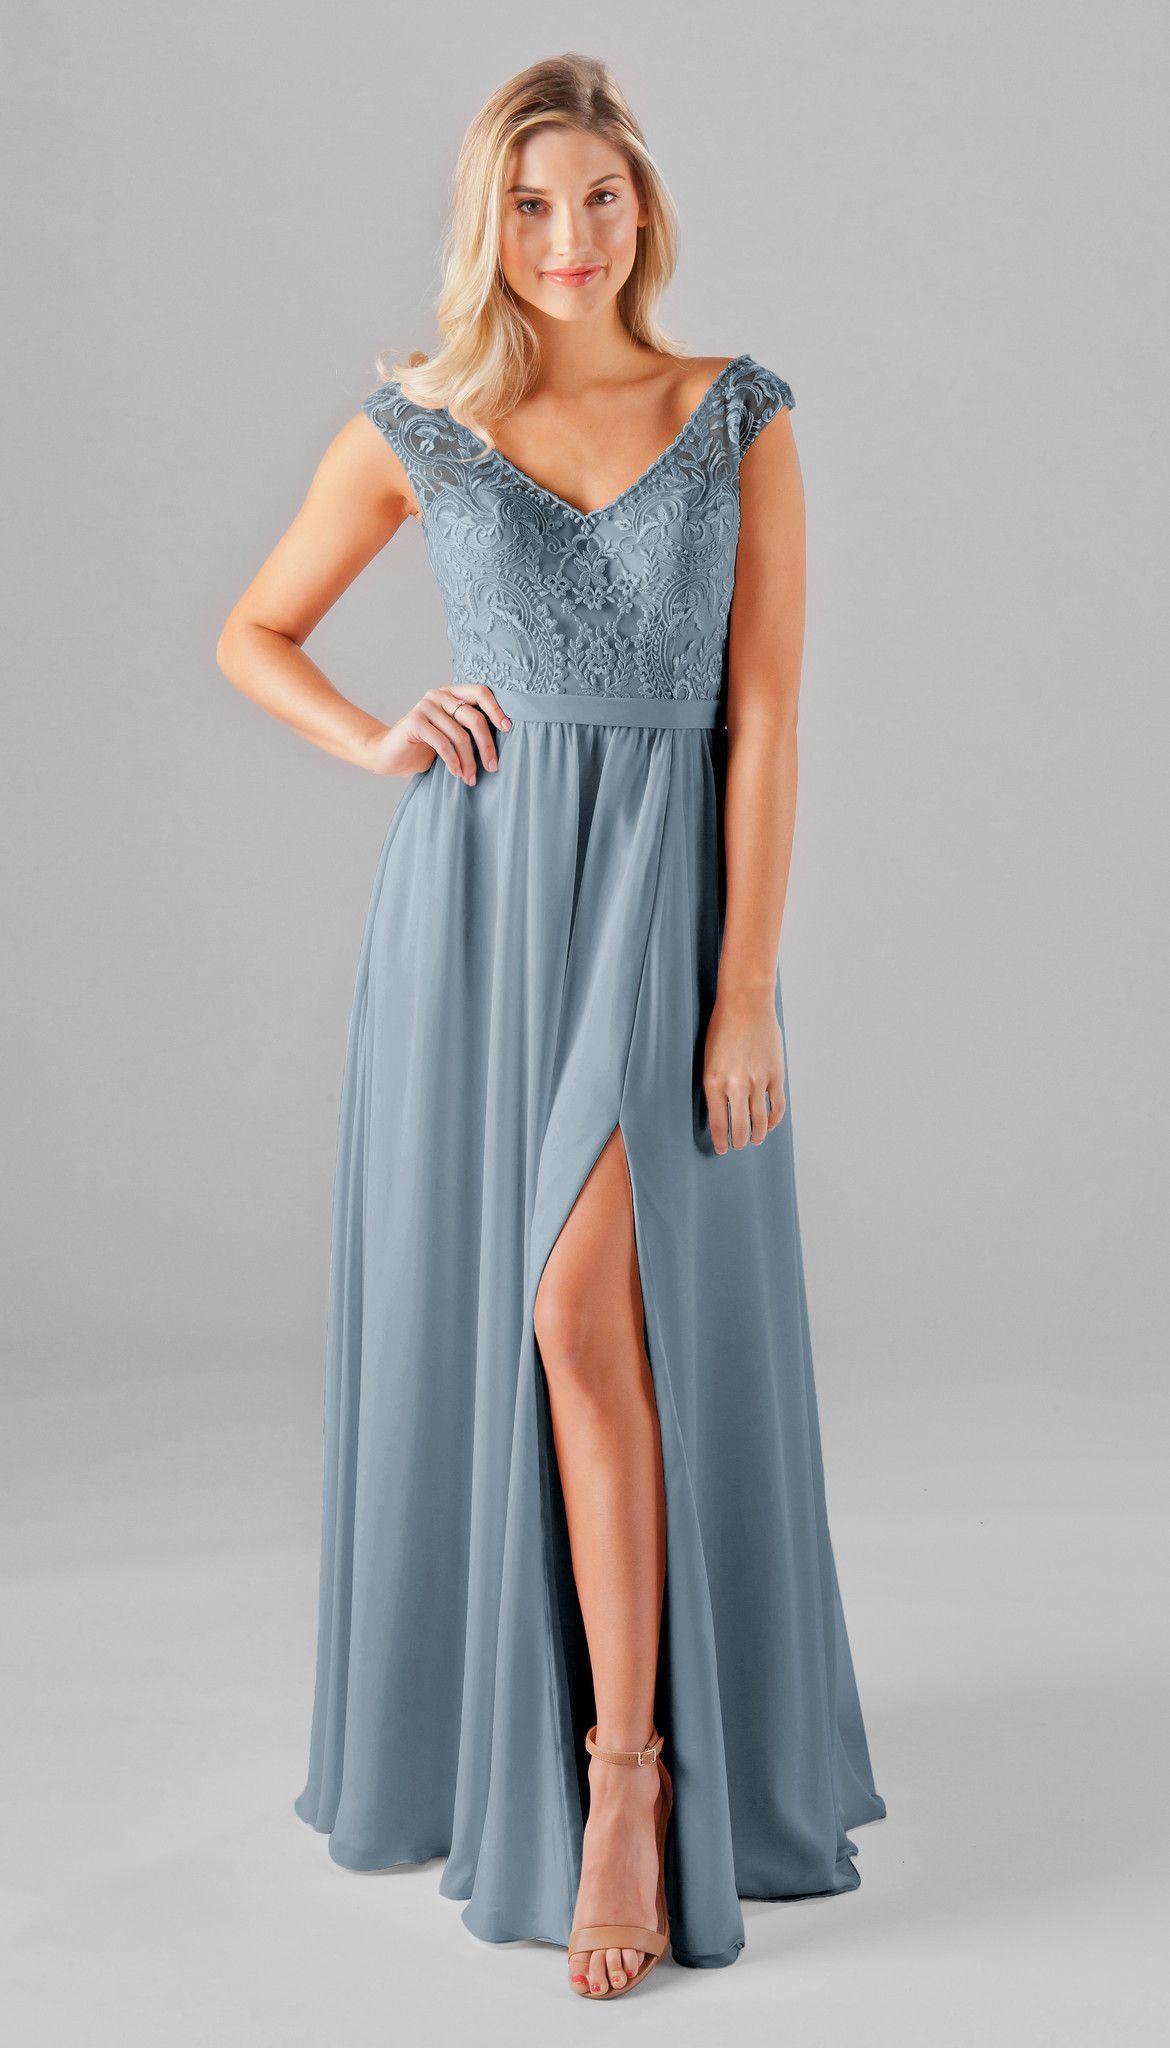 1f544eddc9 Morgan Embroidered Lace Bridesmaid Dress Morgan Dress